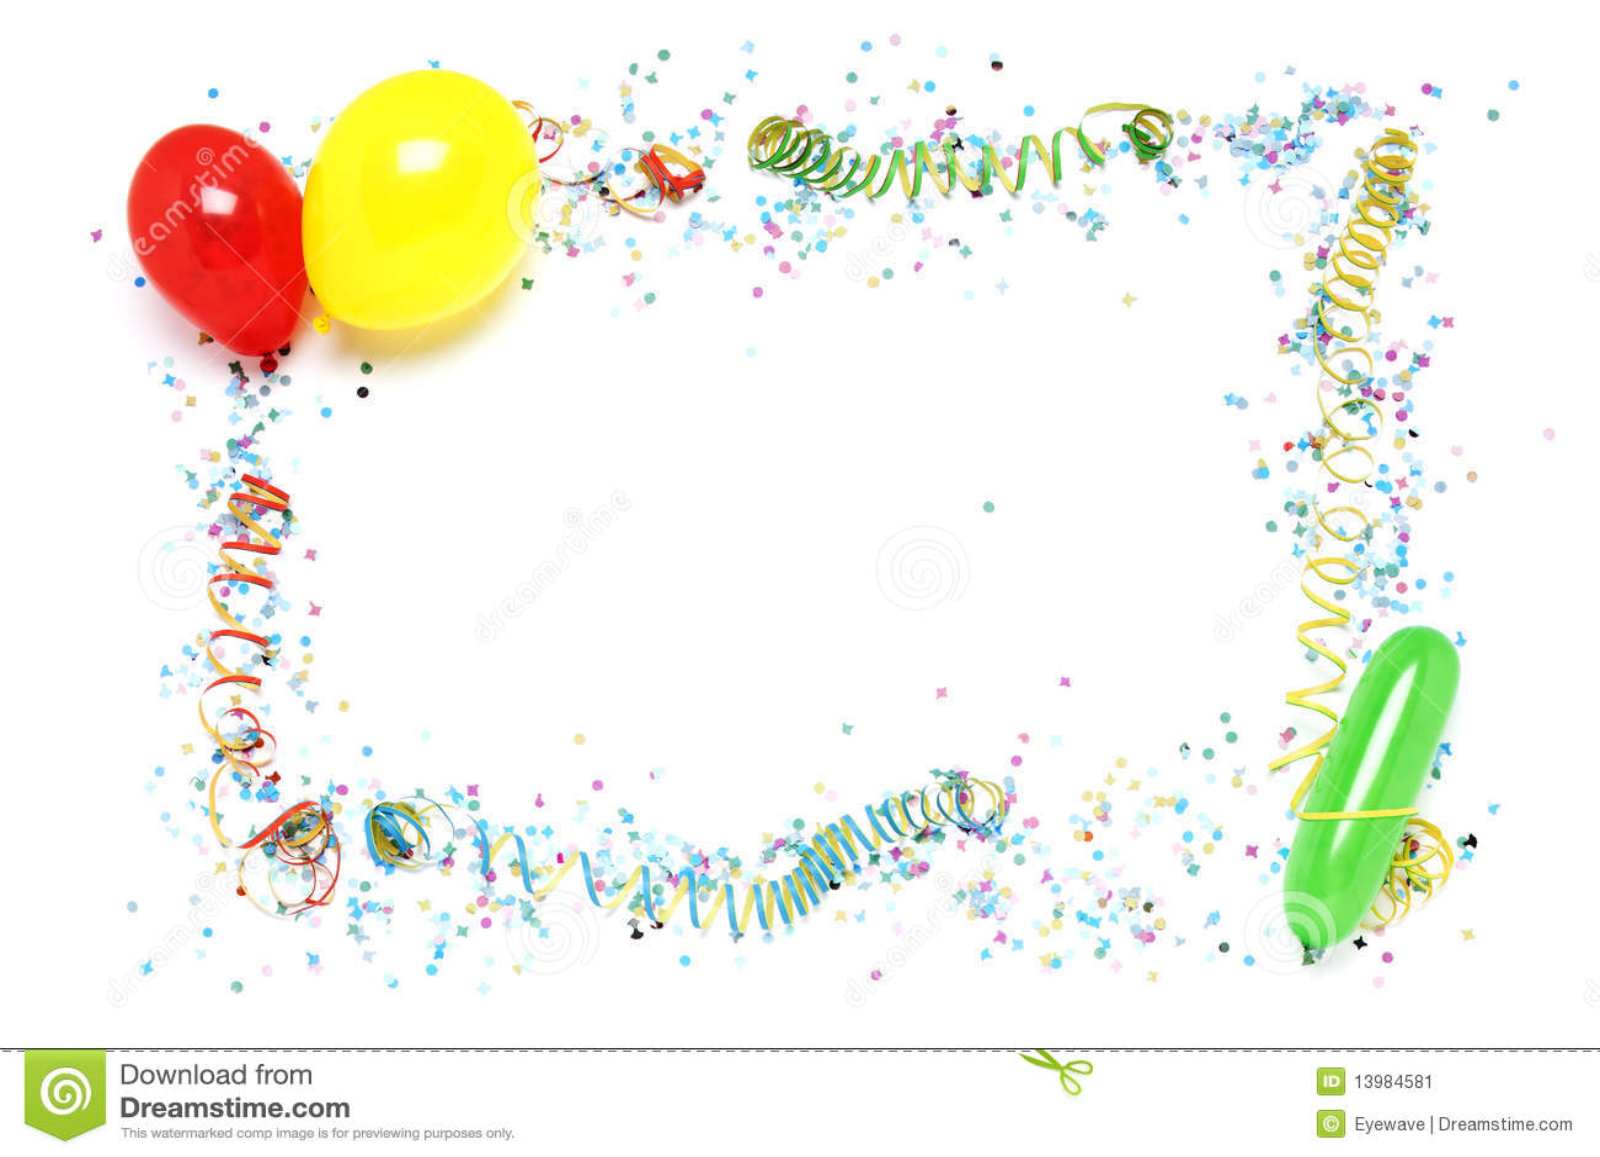 Party Decoration Frame Stock Image Image 13984581